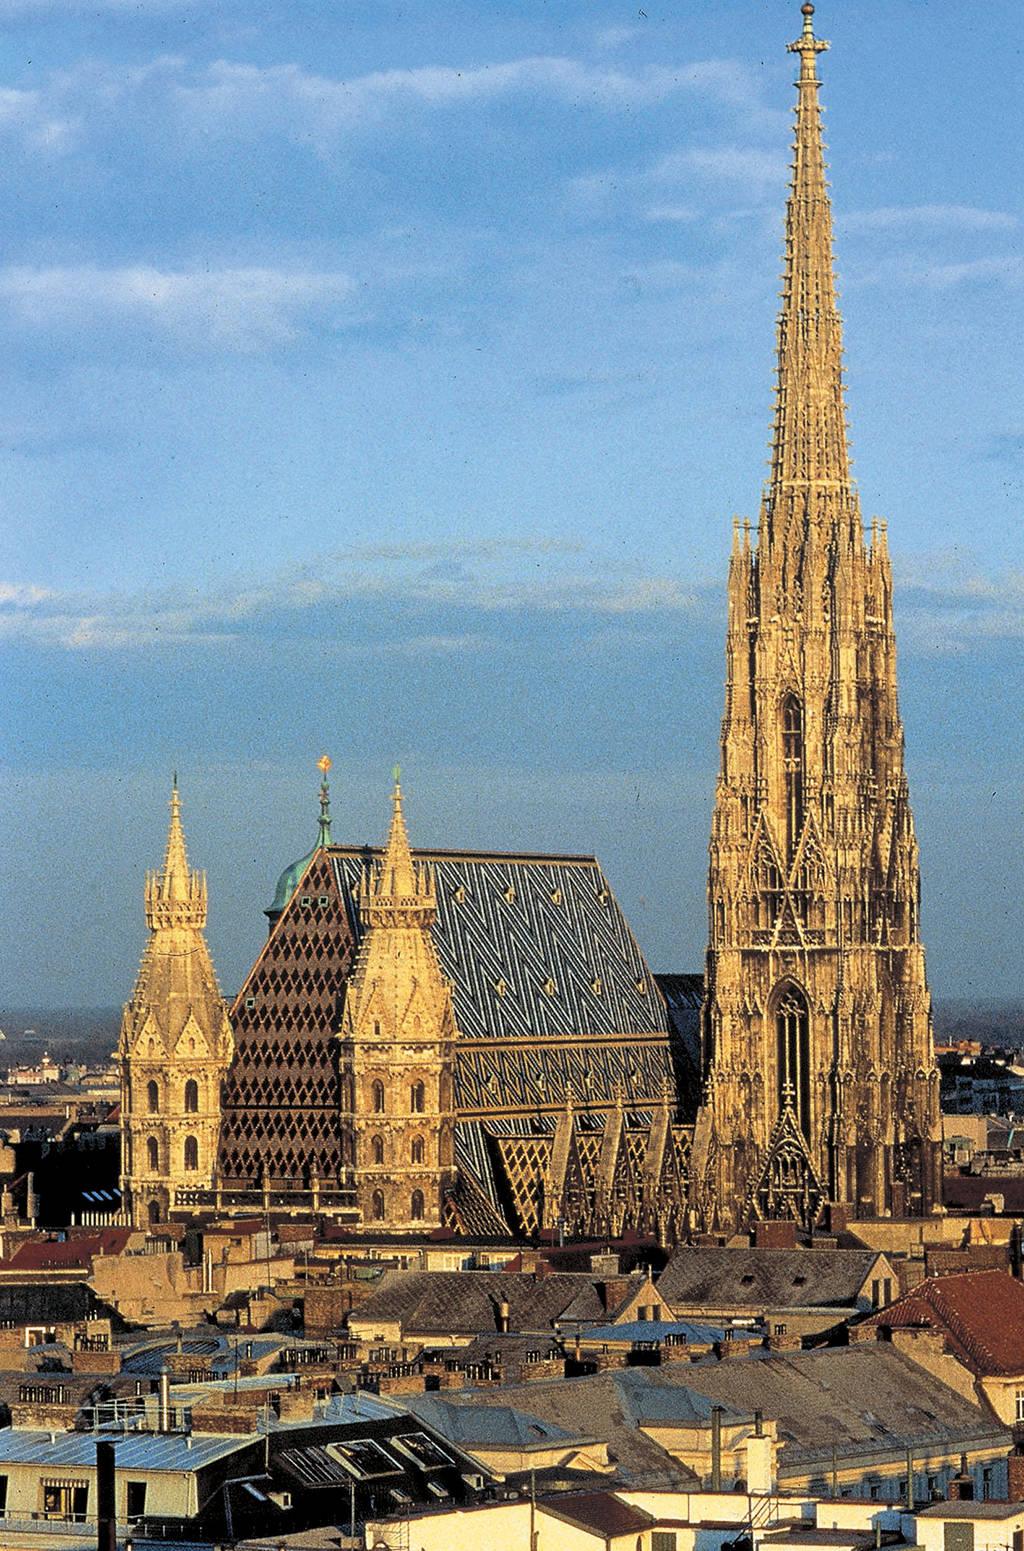 8-daagse busreis Historisch Wenen